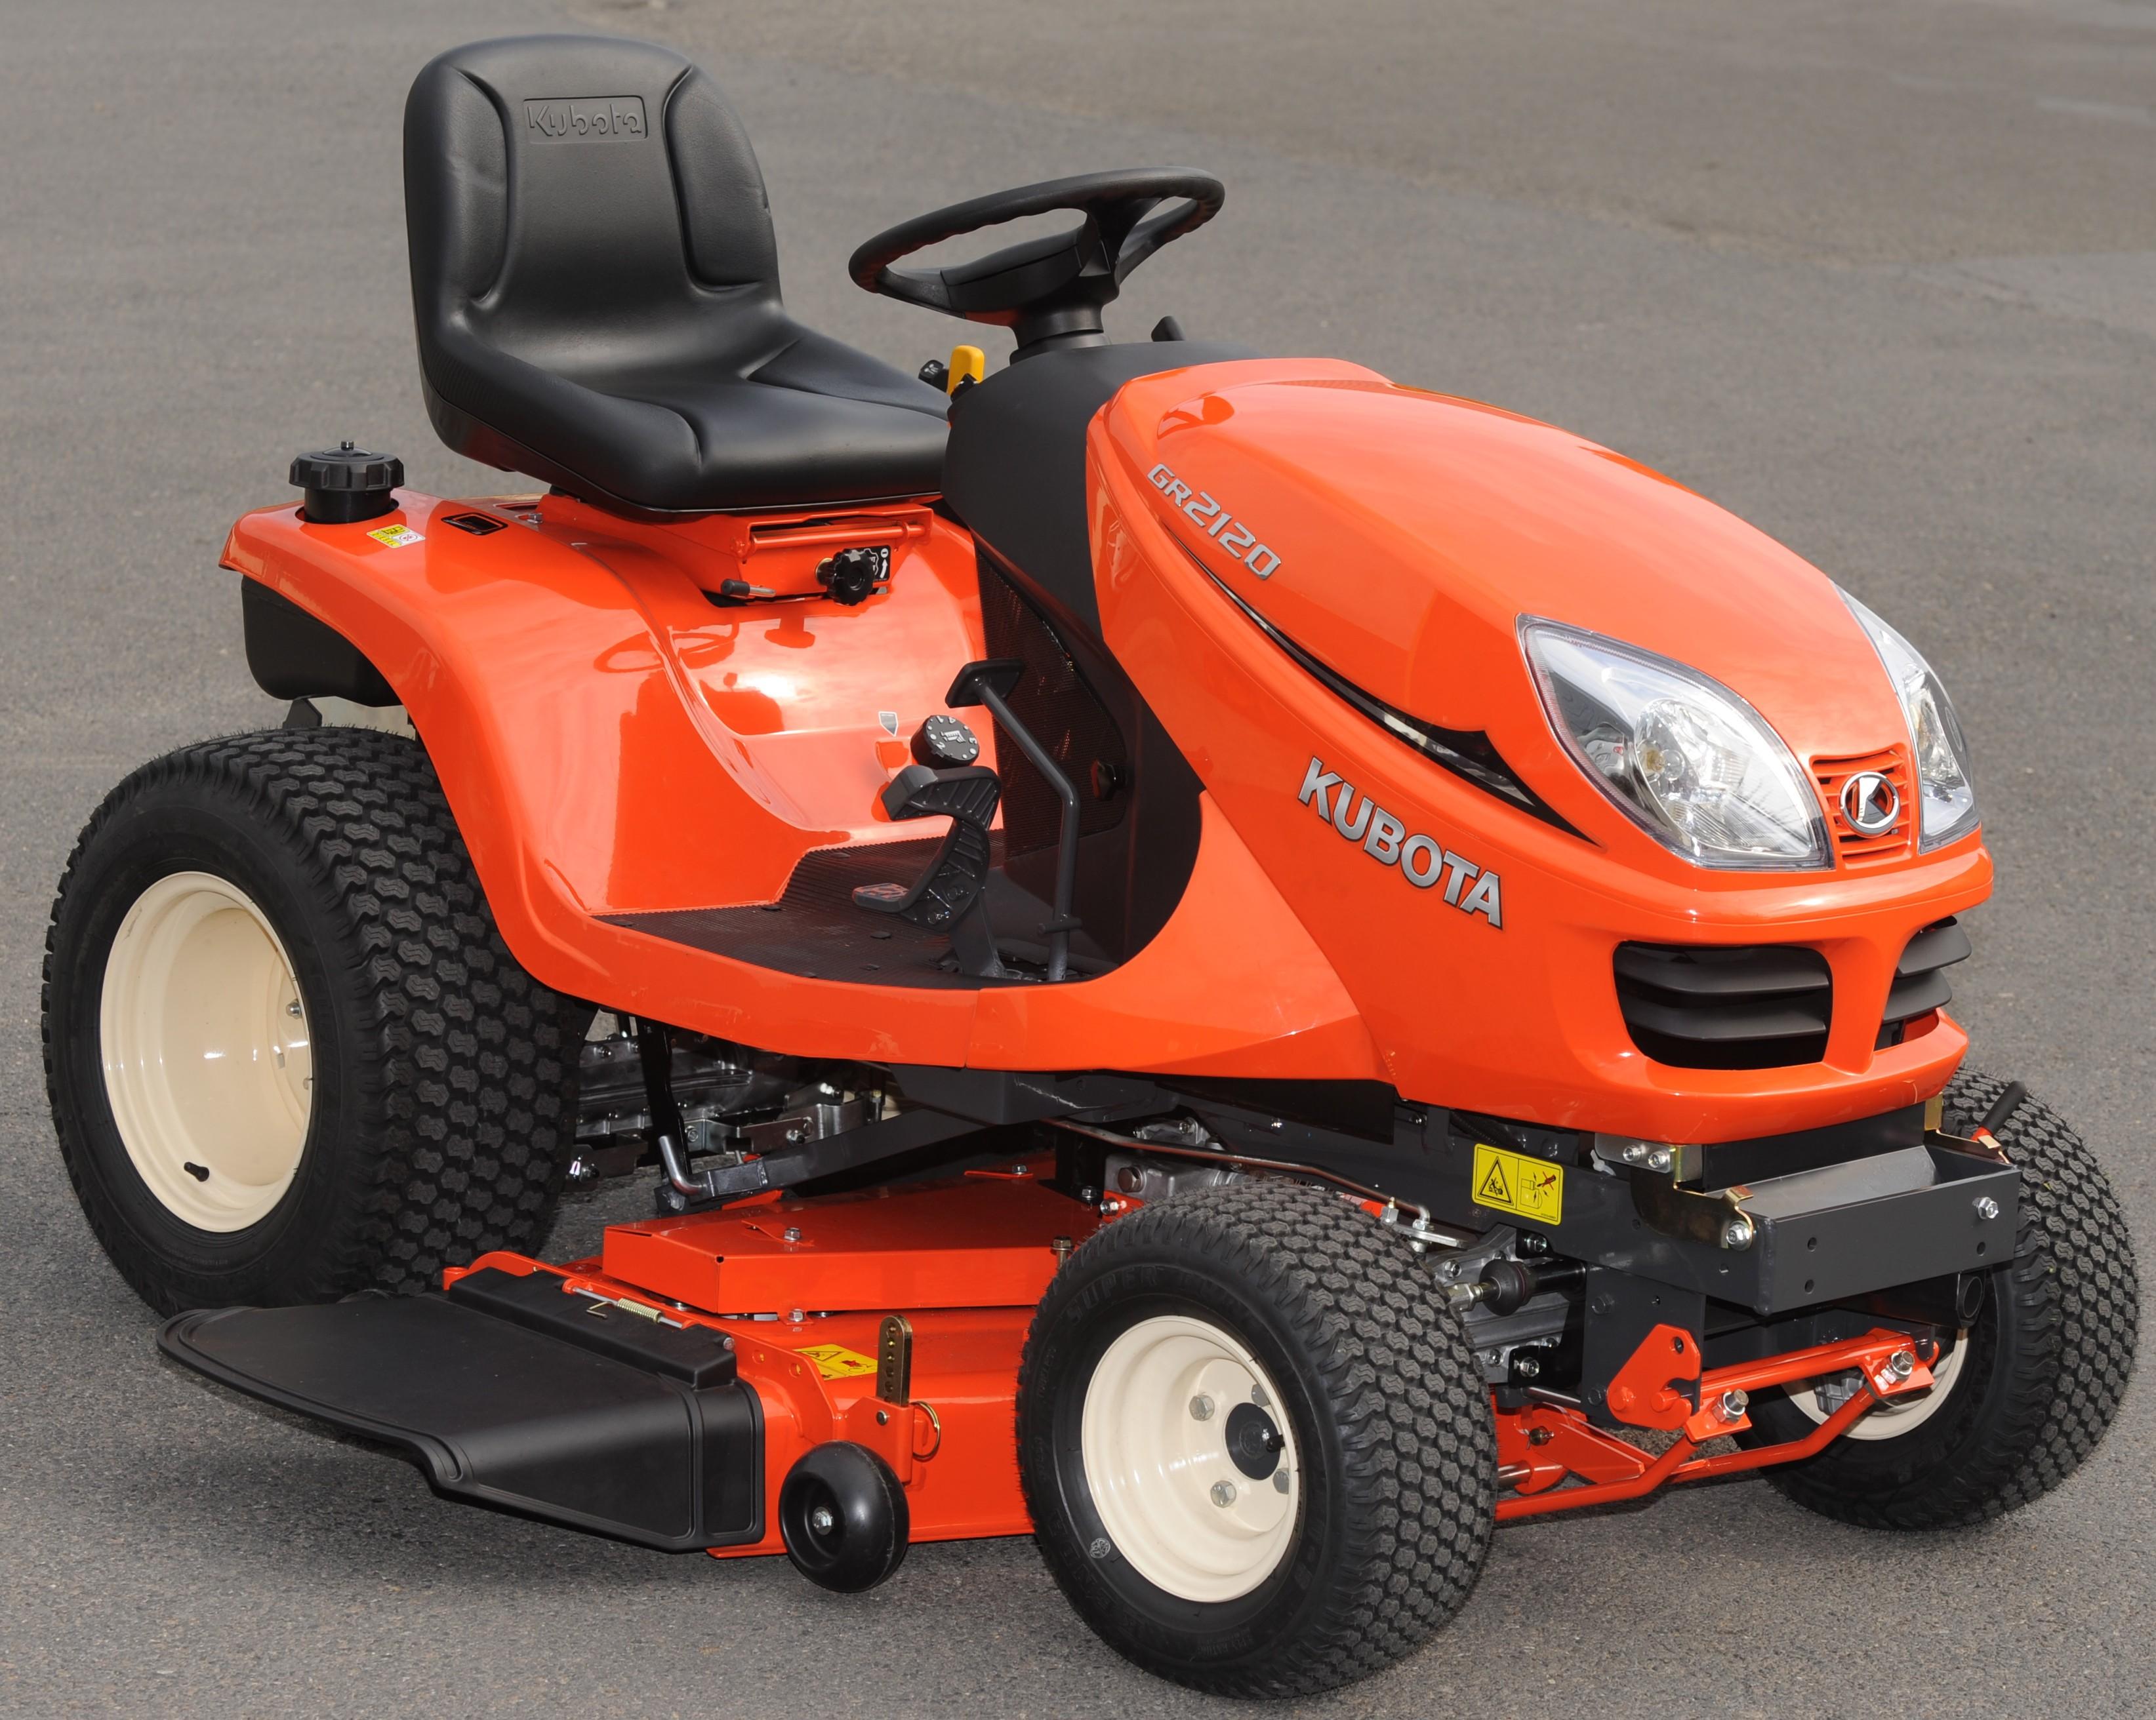 Kubota Lawn Tractors T1760 Wiring Diagram Gr2120 And Garden Tractor 21hp Diesel Engine Toronto